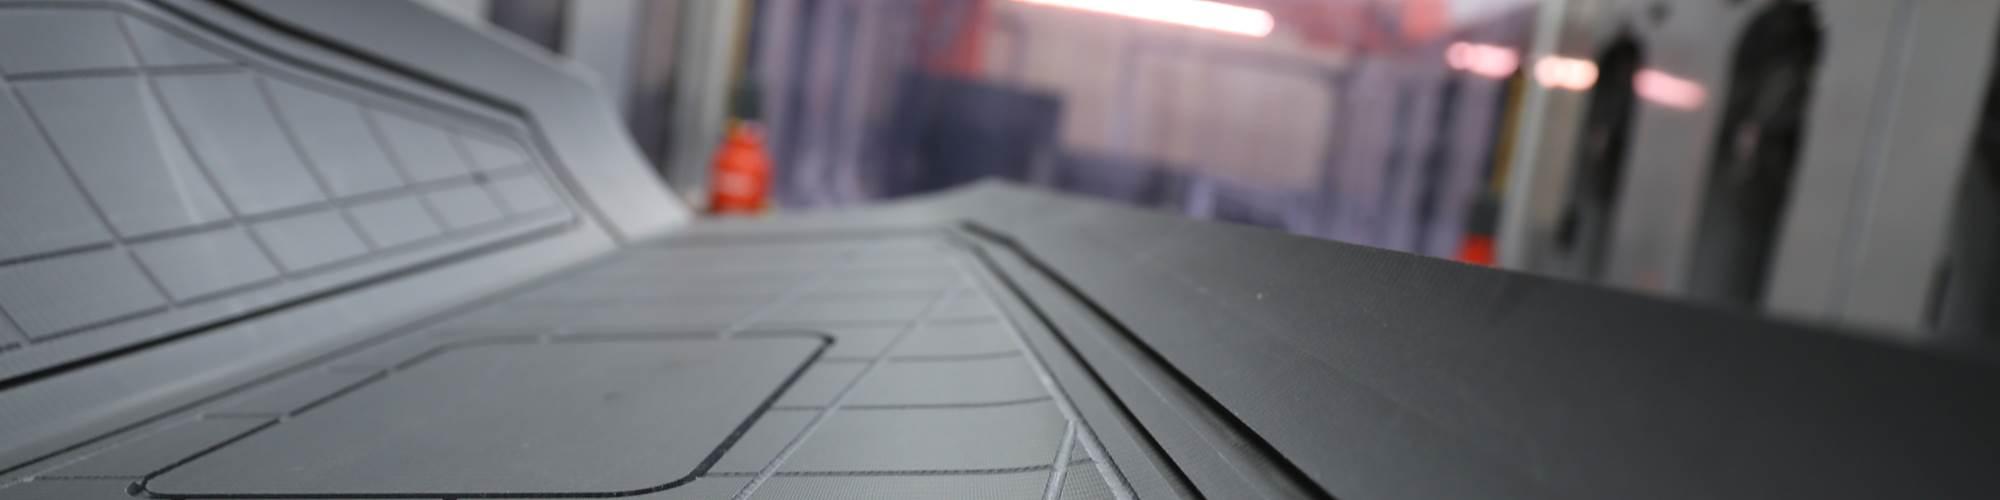 Ascent Aerospace lsam打印工具